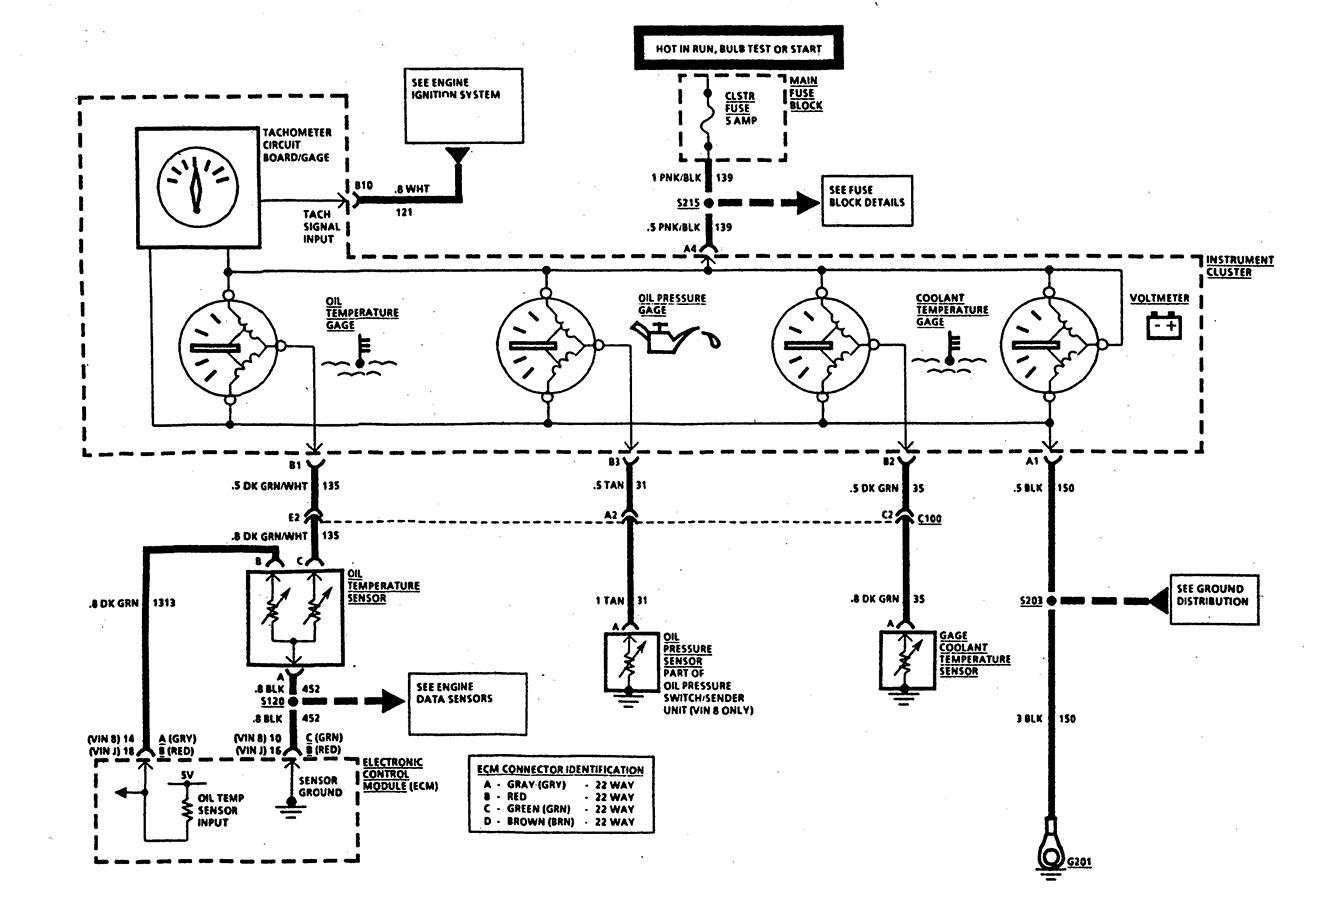 1991 corvette wiring diagram davo, i have a 1991 corvette standard c4. the tachometer ... #4